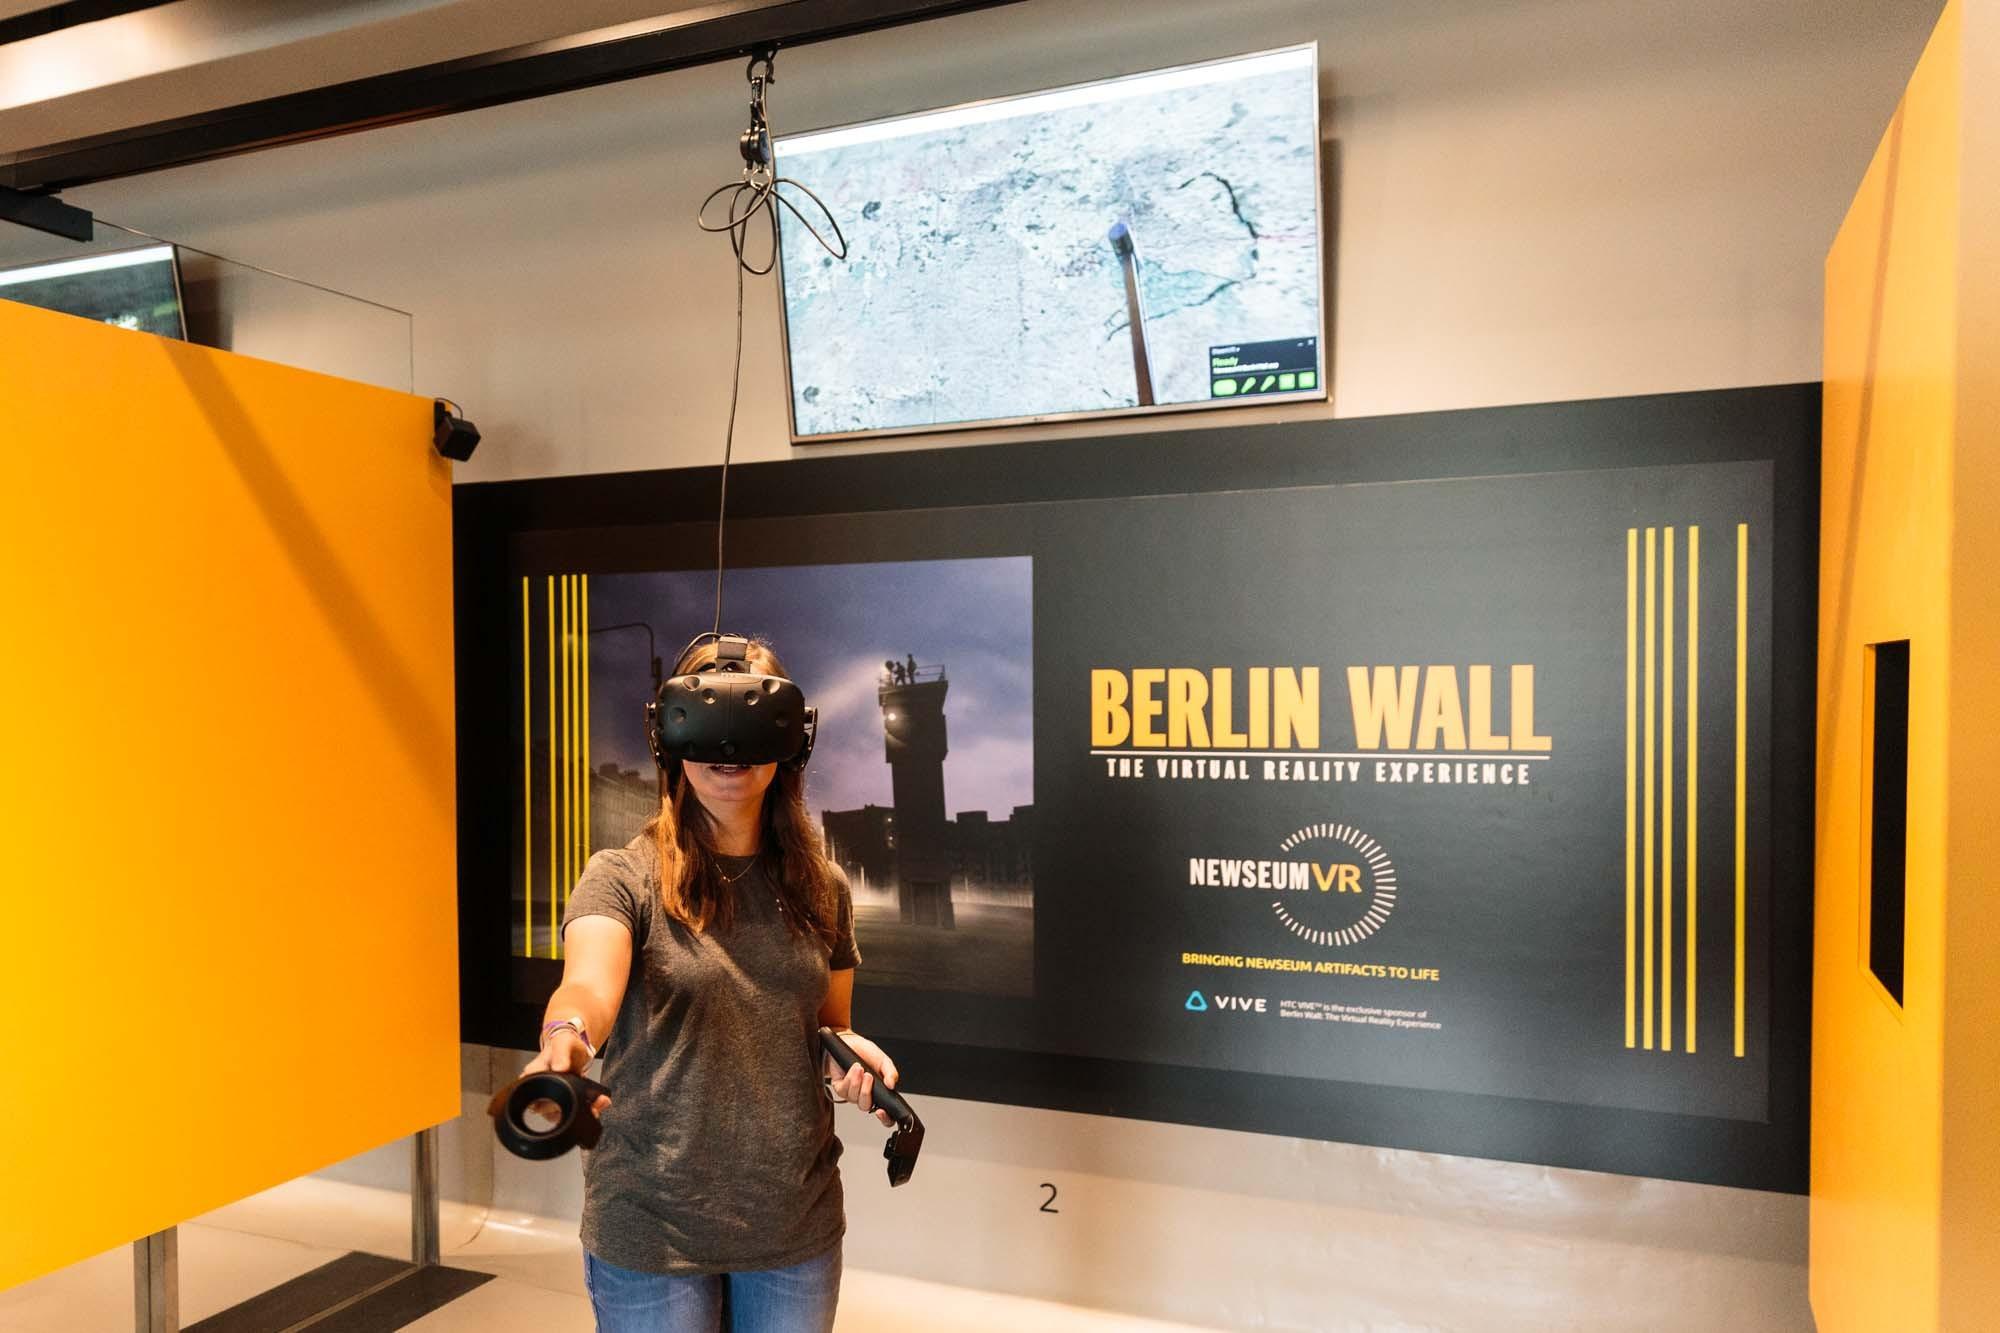 HTC VIVE投数百万美元启动全球虚拟现实艺术计划